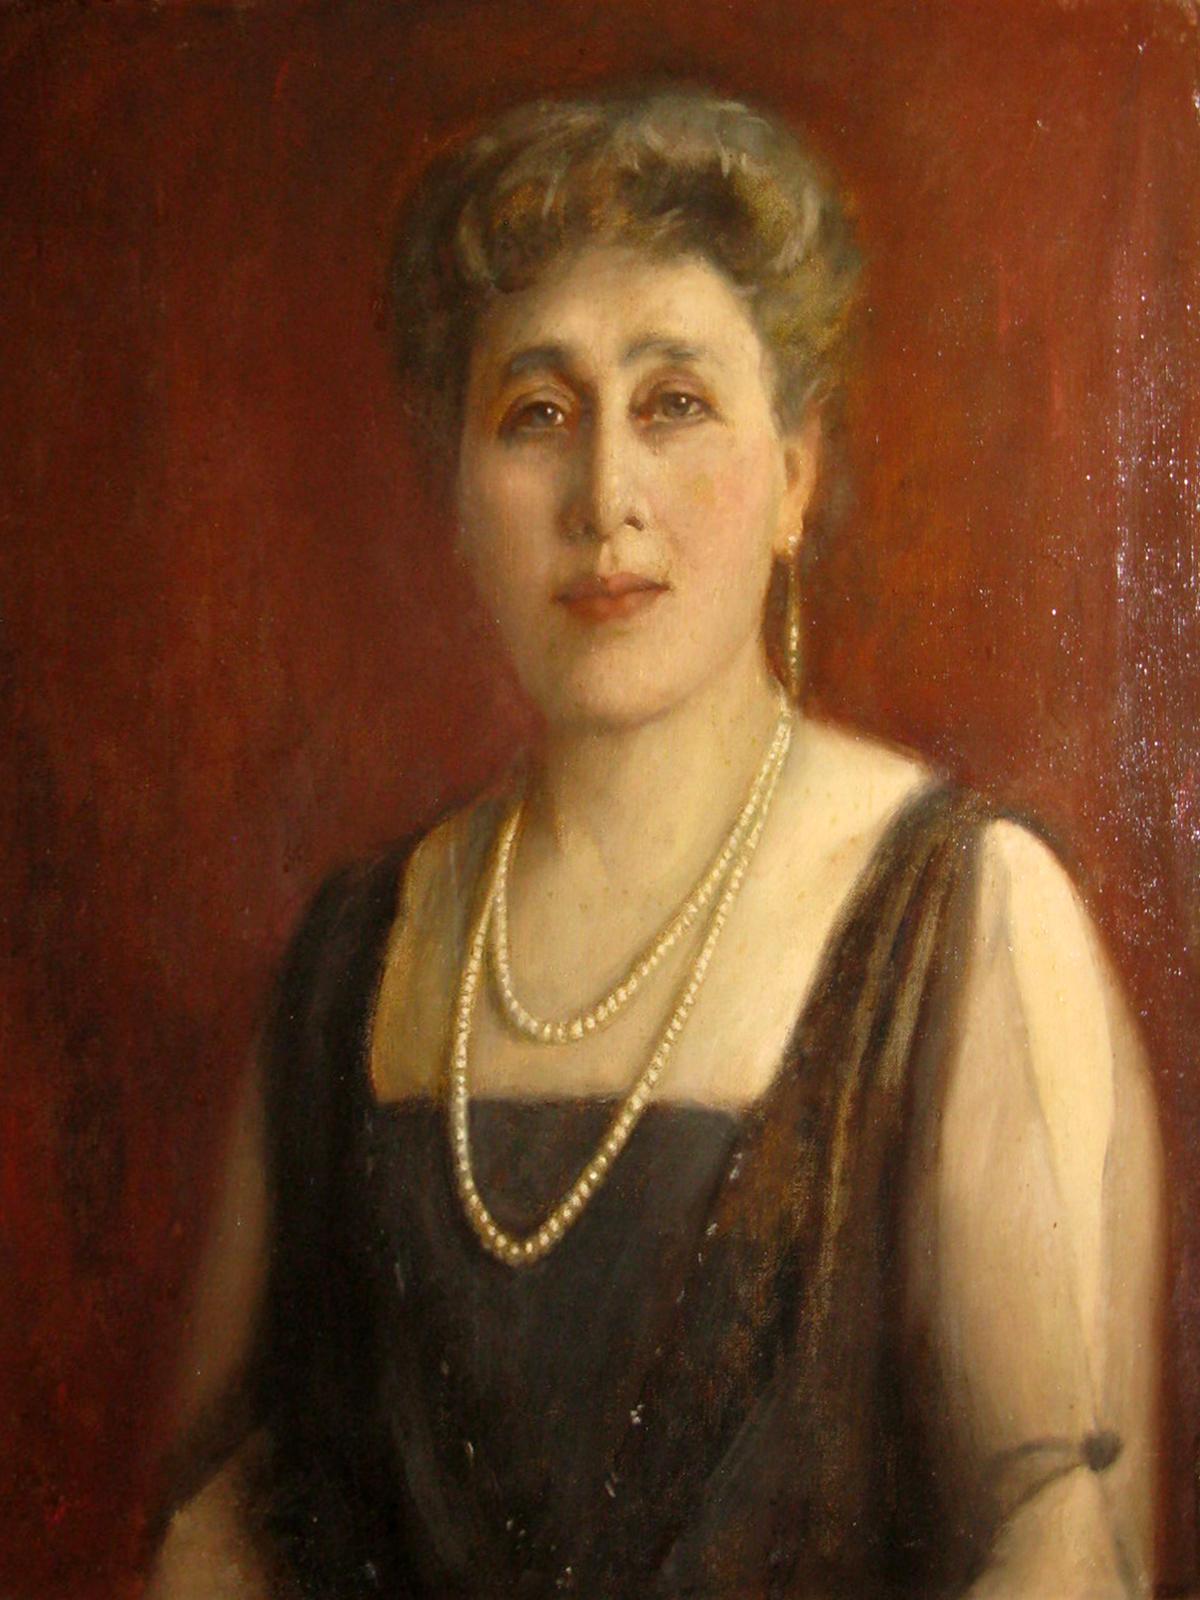 Portraits of Lady Tuck